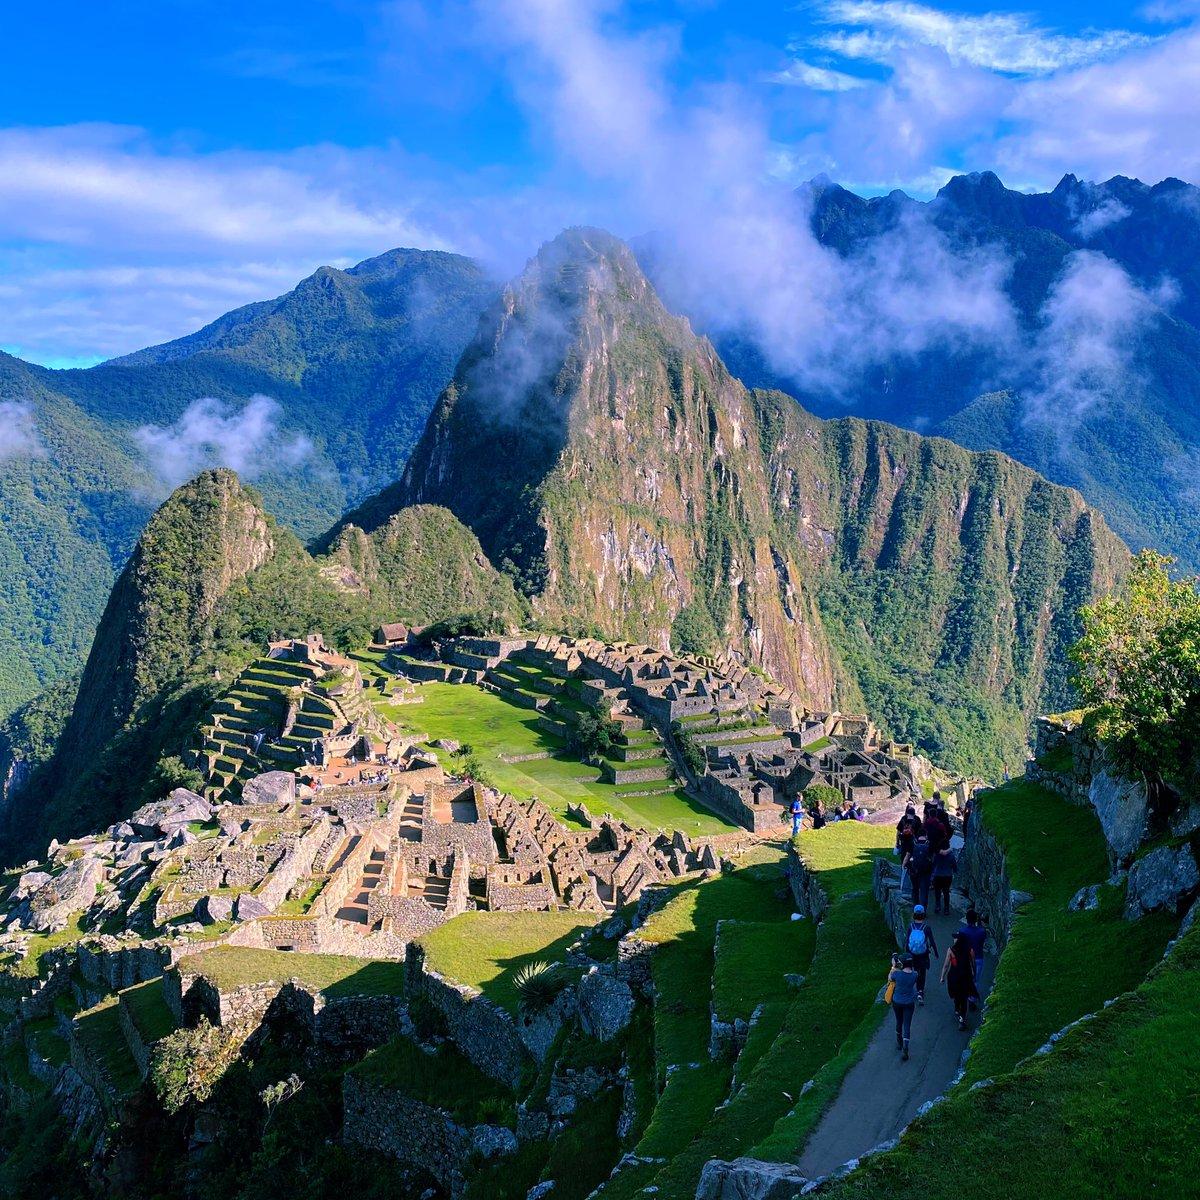 New Seven Wonders of the World 🌎 - #Machupicchu #travelphotography #naturephotography #trip #travelblogger #naturelovers #ctperu #nature_perfection #trekking #hike #cusco #wonderlust #america #mountains #explore #love #lonelyplanet #natgeo #discovery #lifestyle #stayhome #ruins https://t.co/1PDMuZG3Lo